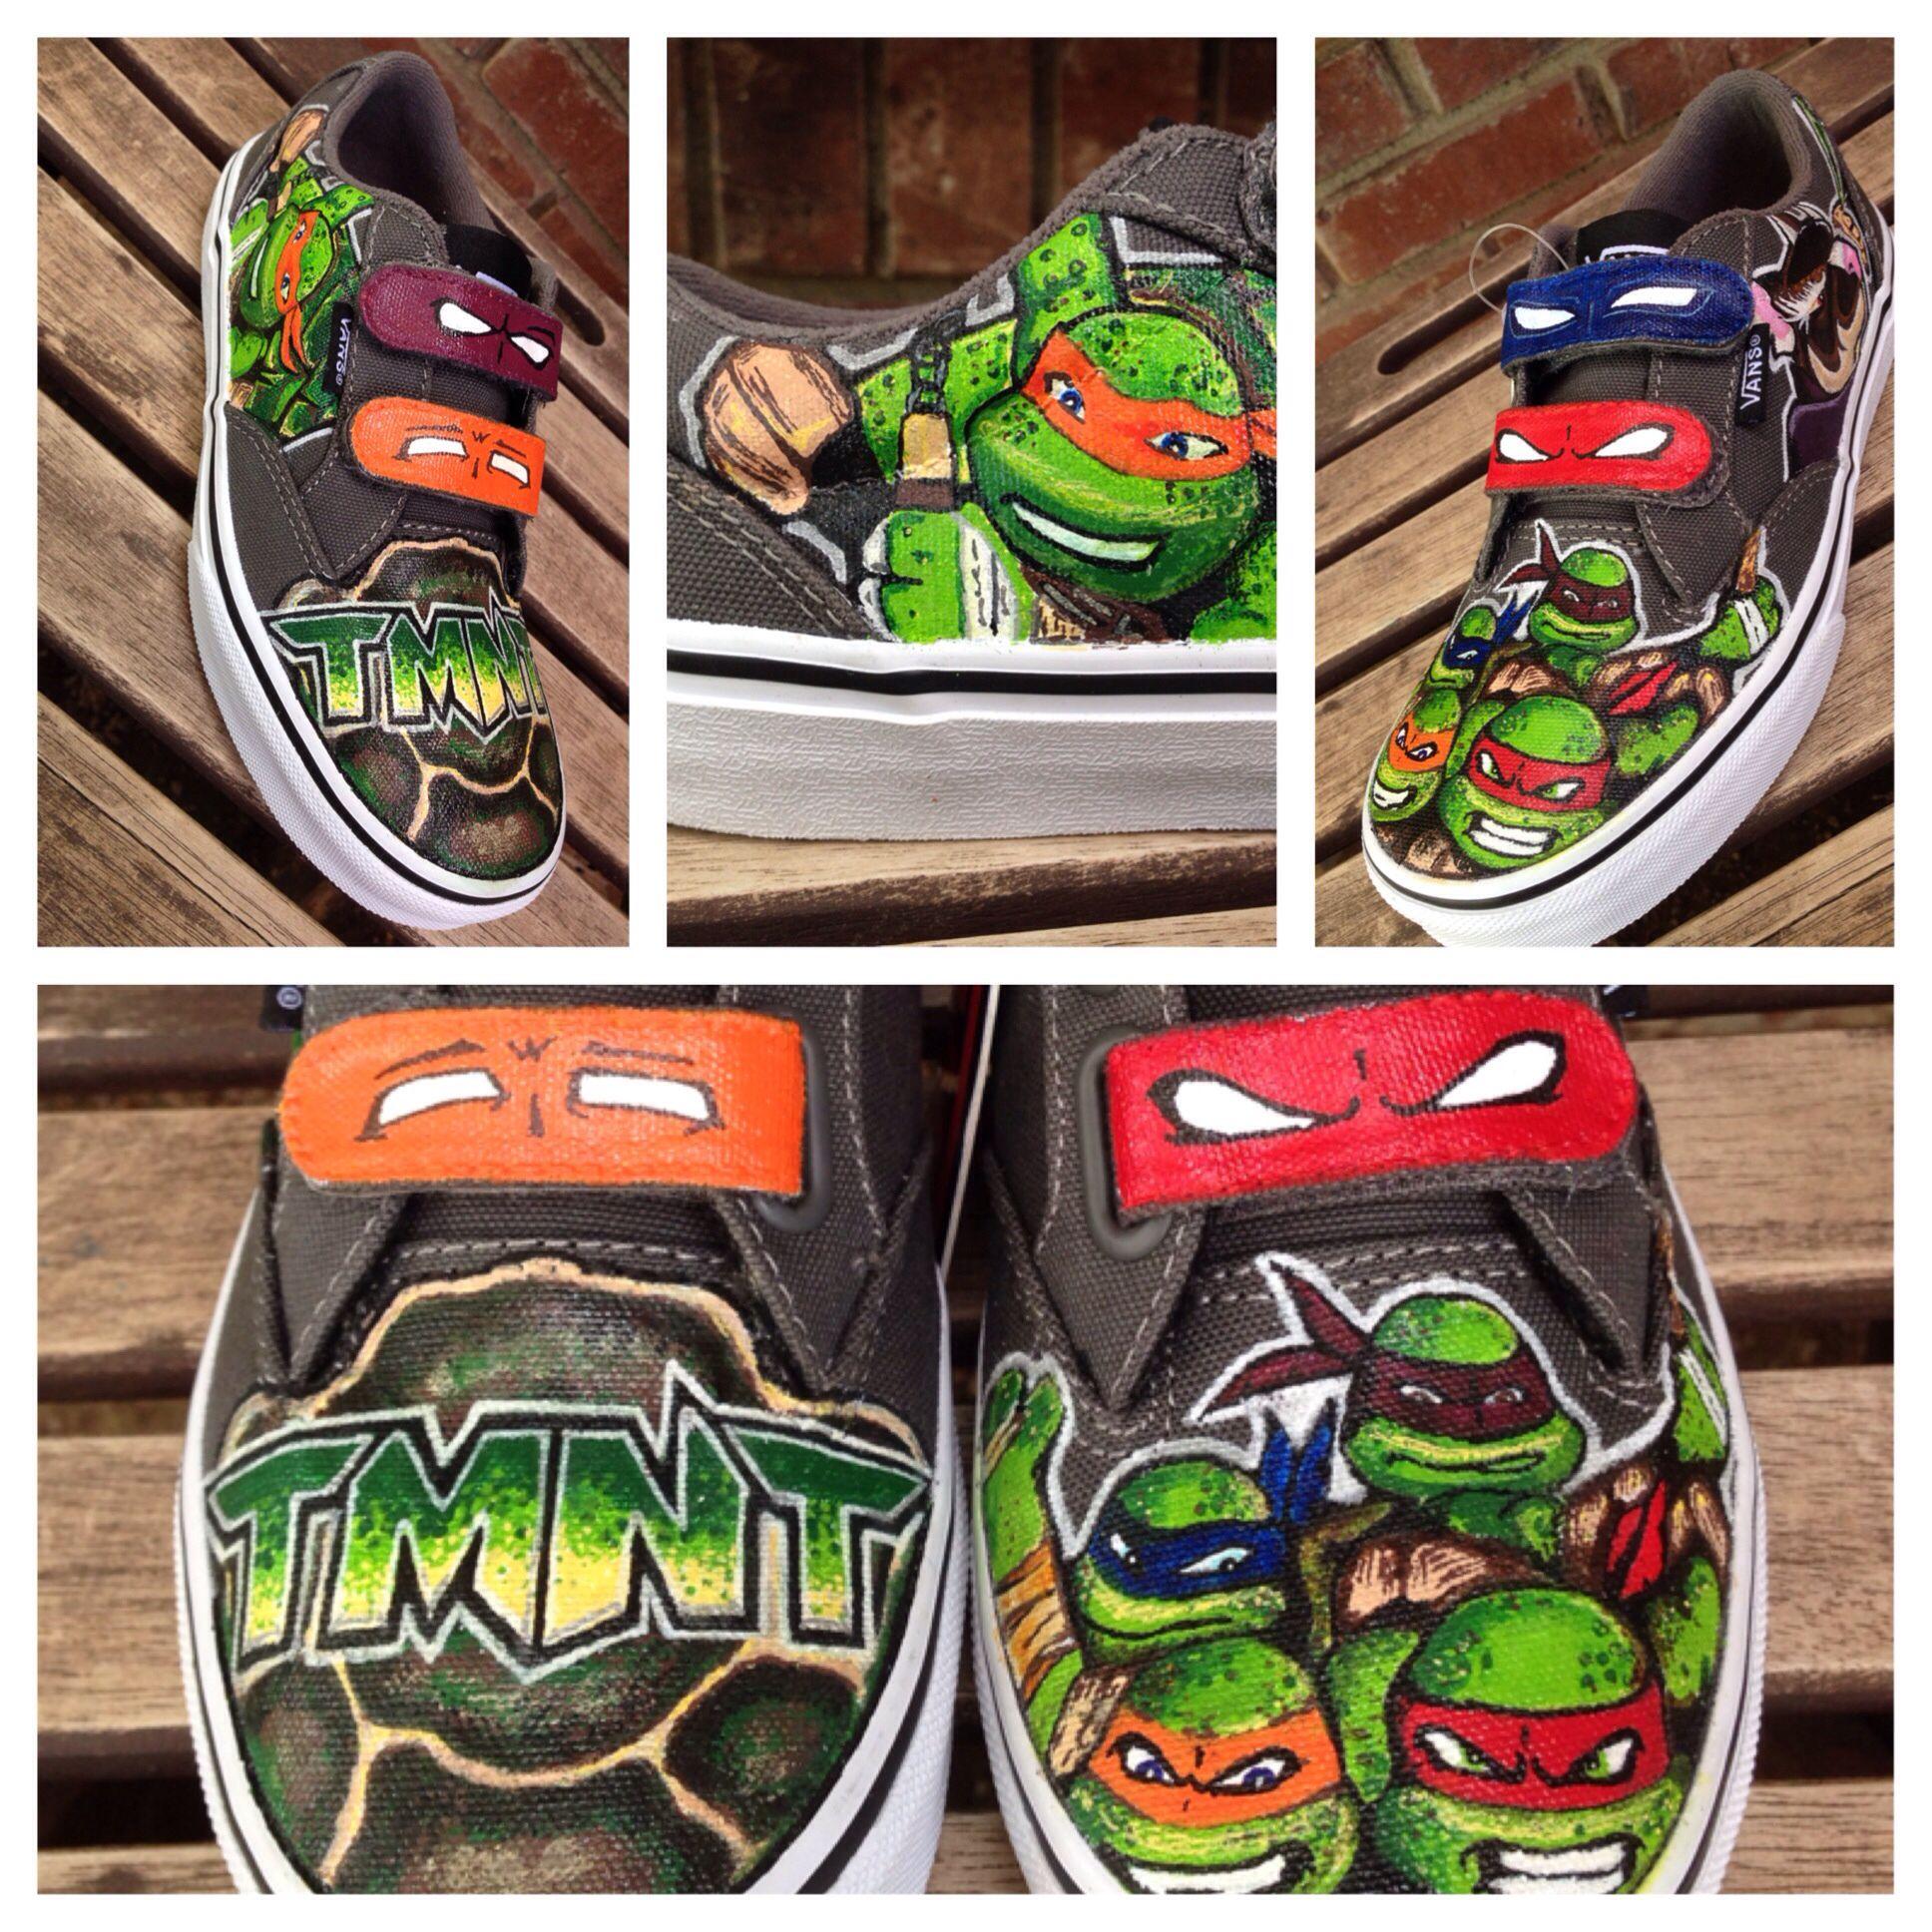 23ffa631b020b5 Custom Teenage Mutant Ninja Turtle vans GS size 2. COWABUNGA DUDE ...